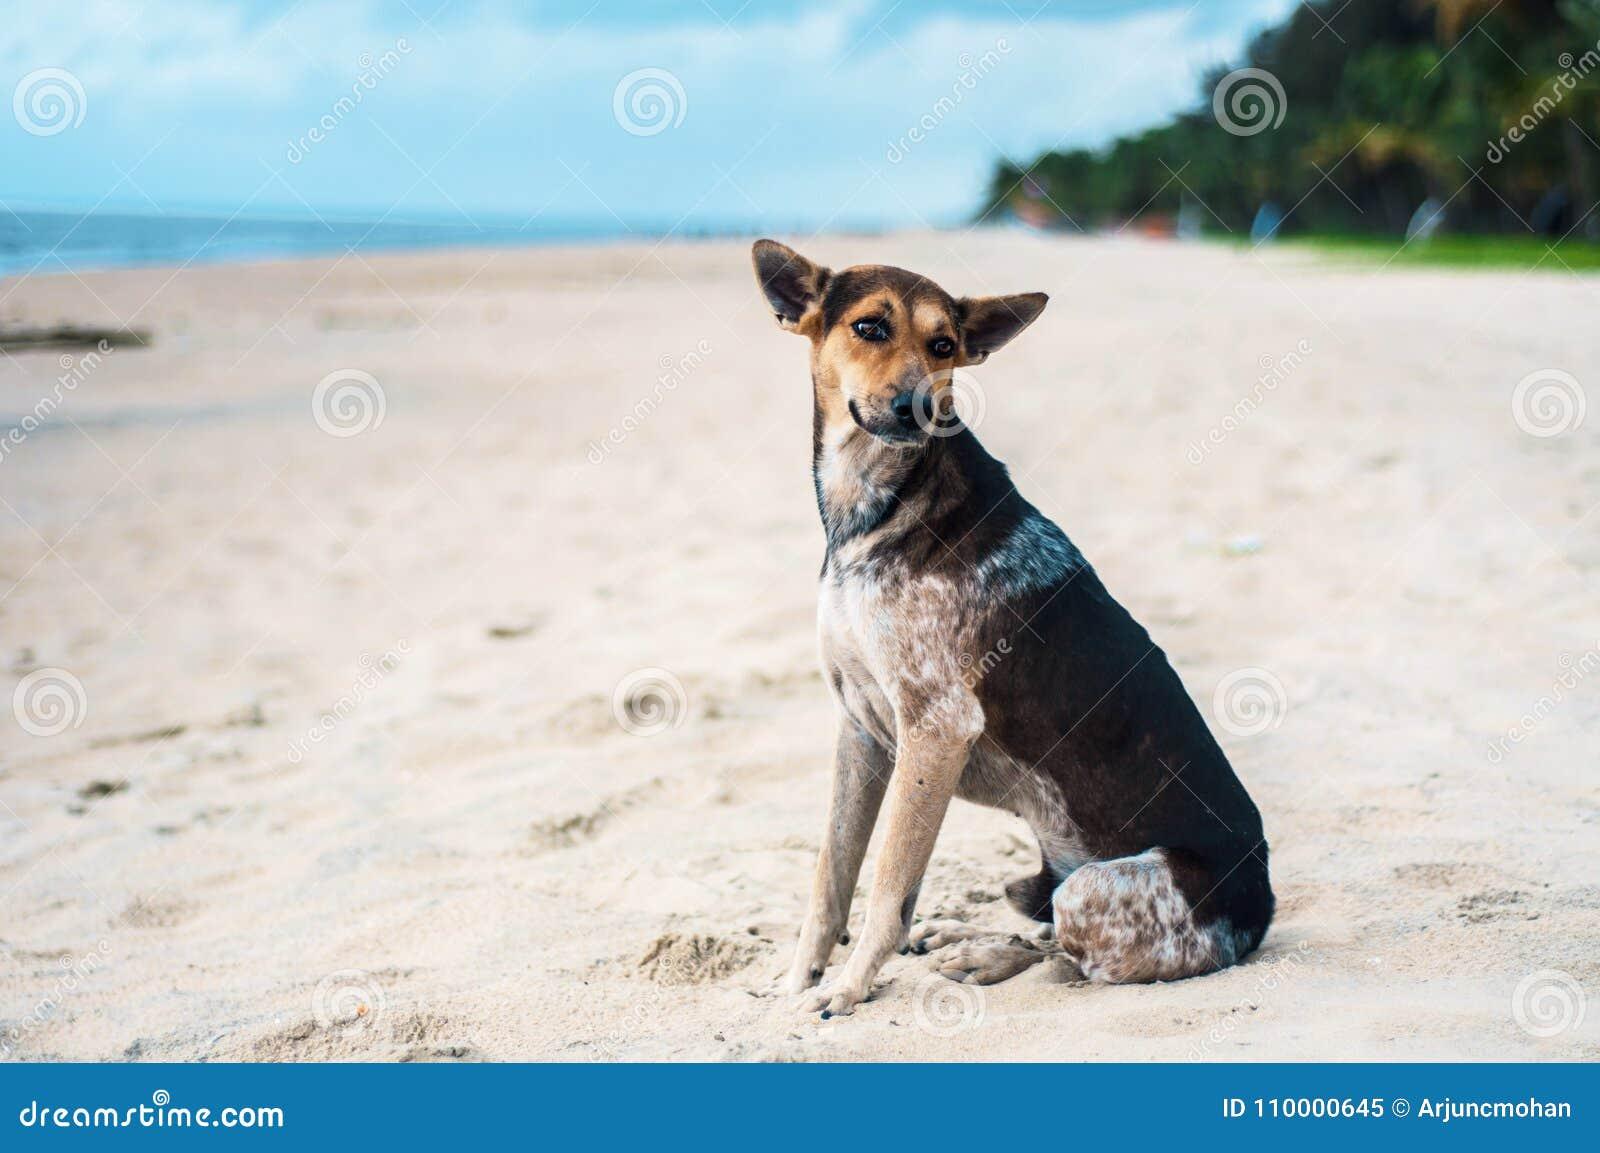 Tan And Black Stray Dog At A Beach In Kerala, India  Stock